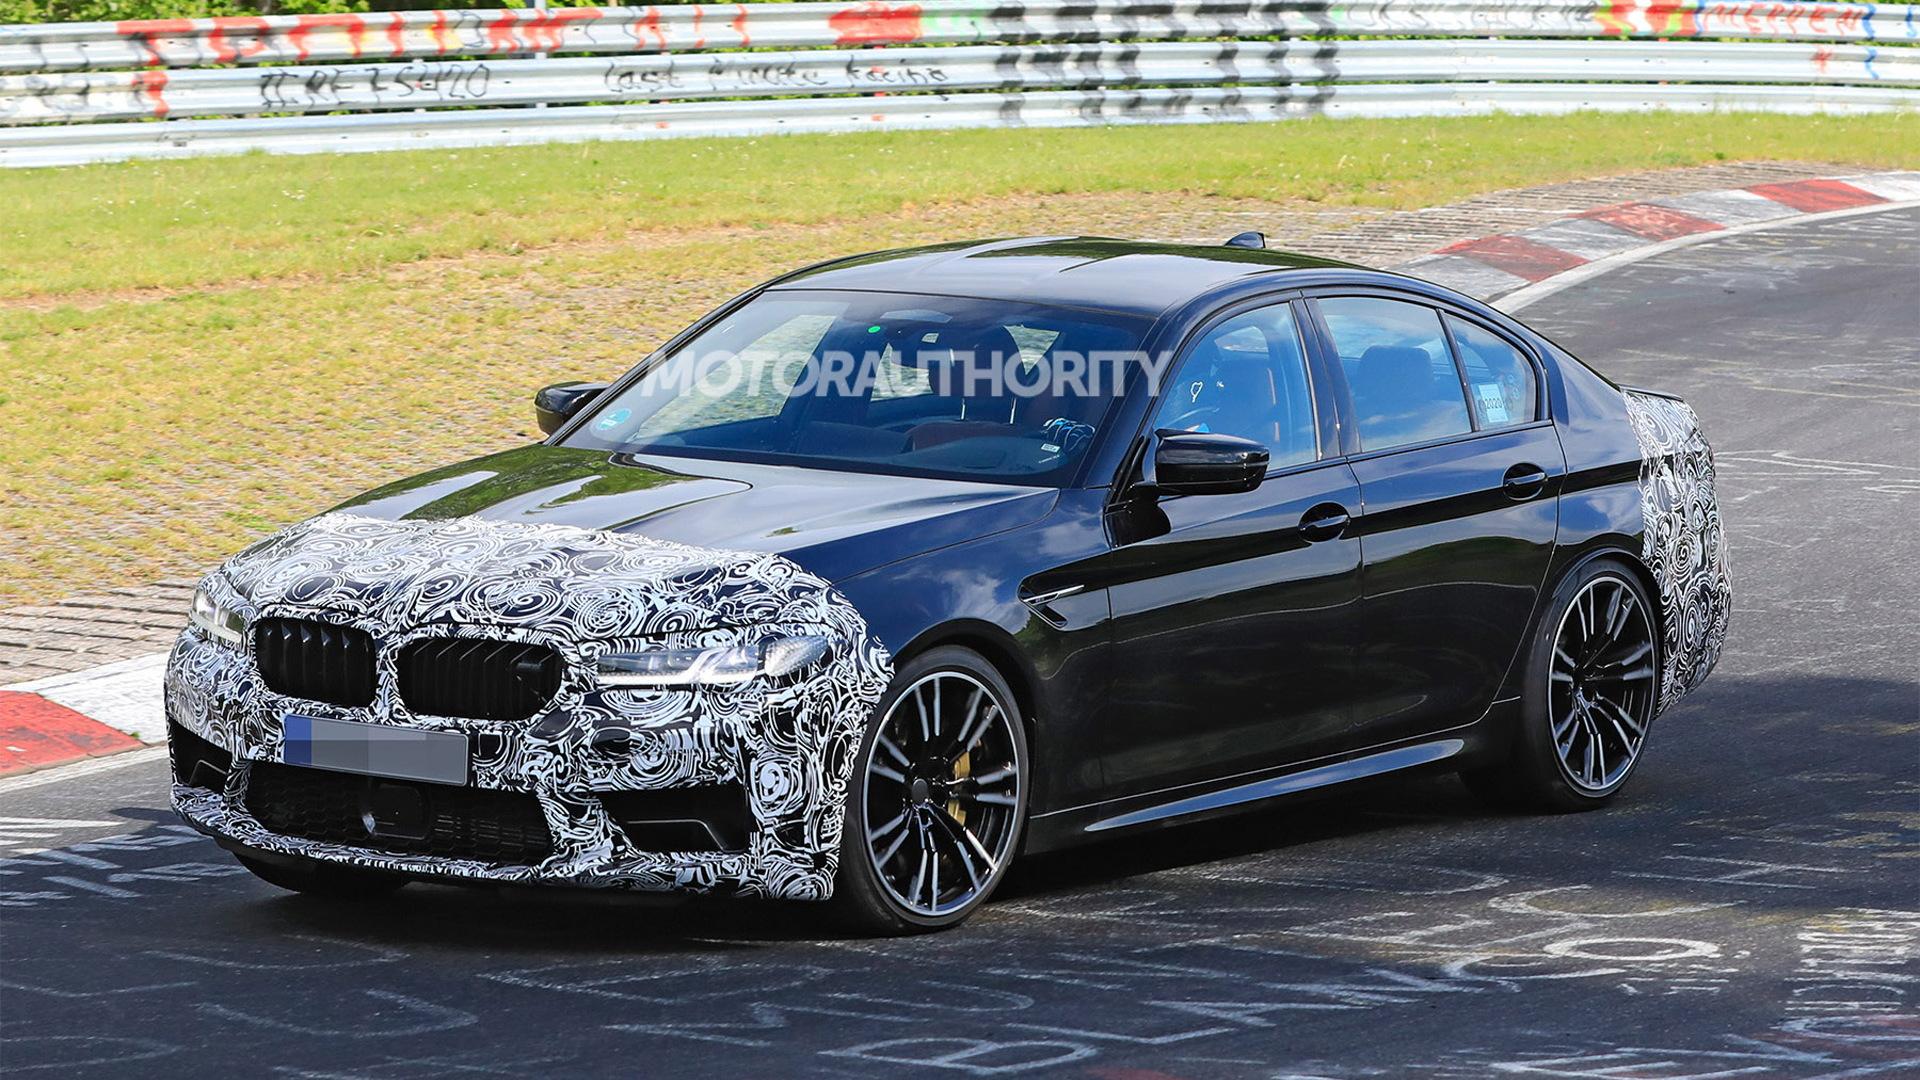 2021 BMW M5 facelift spy shots - Photo credit: S. Baldauf/SB-Medien